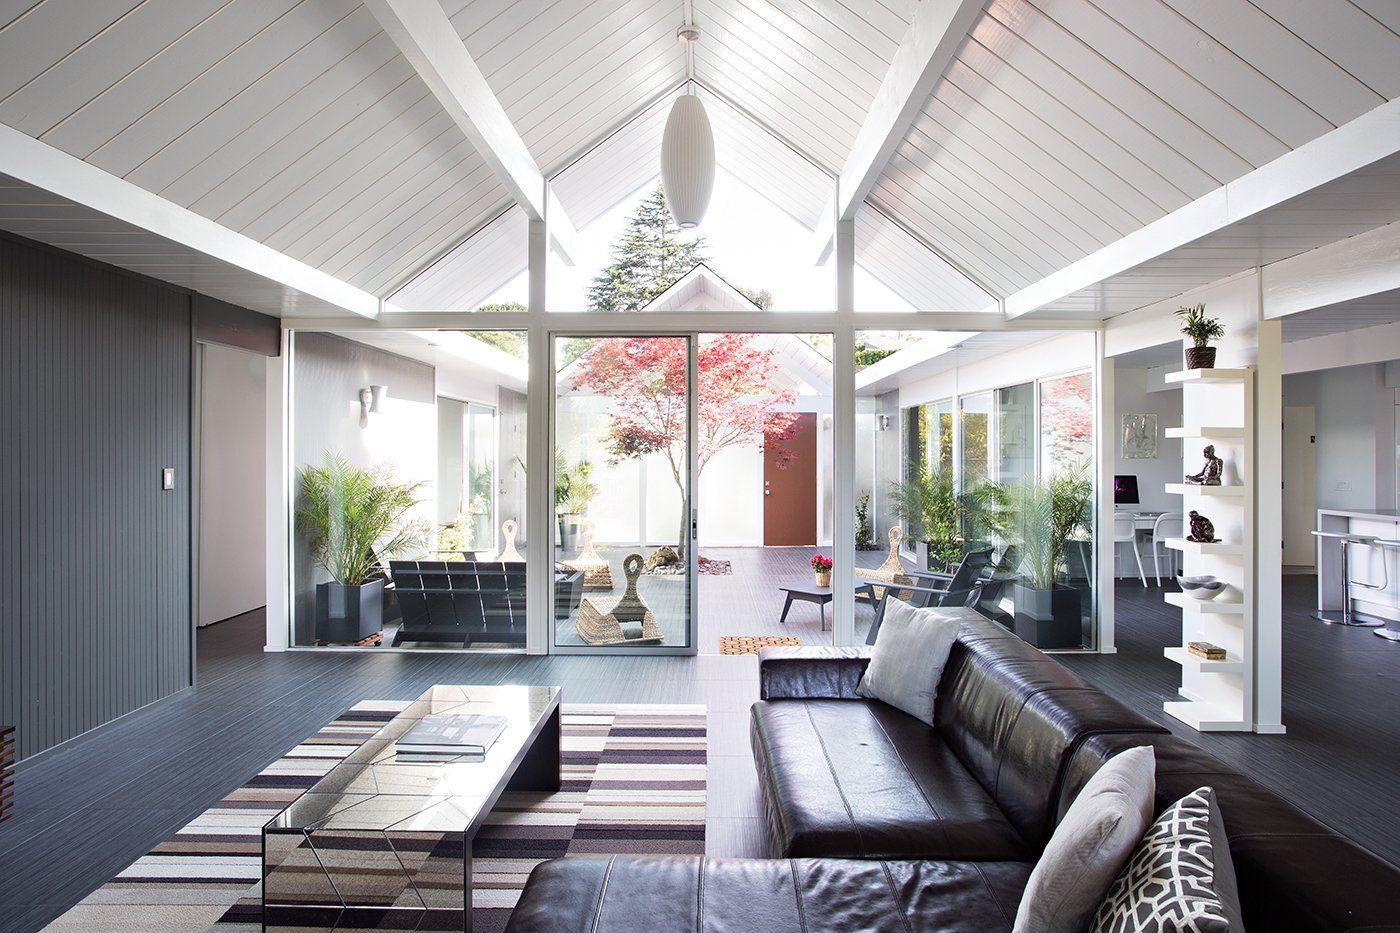 1972-1973 renovated california eichler midcentury home living room and atrium